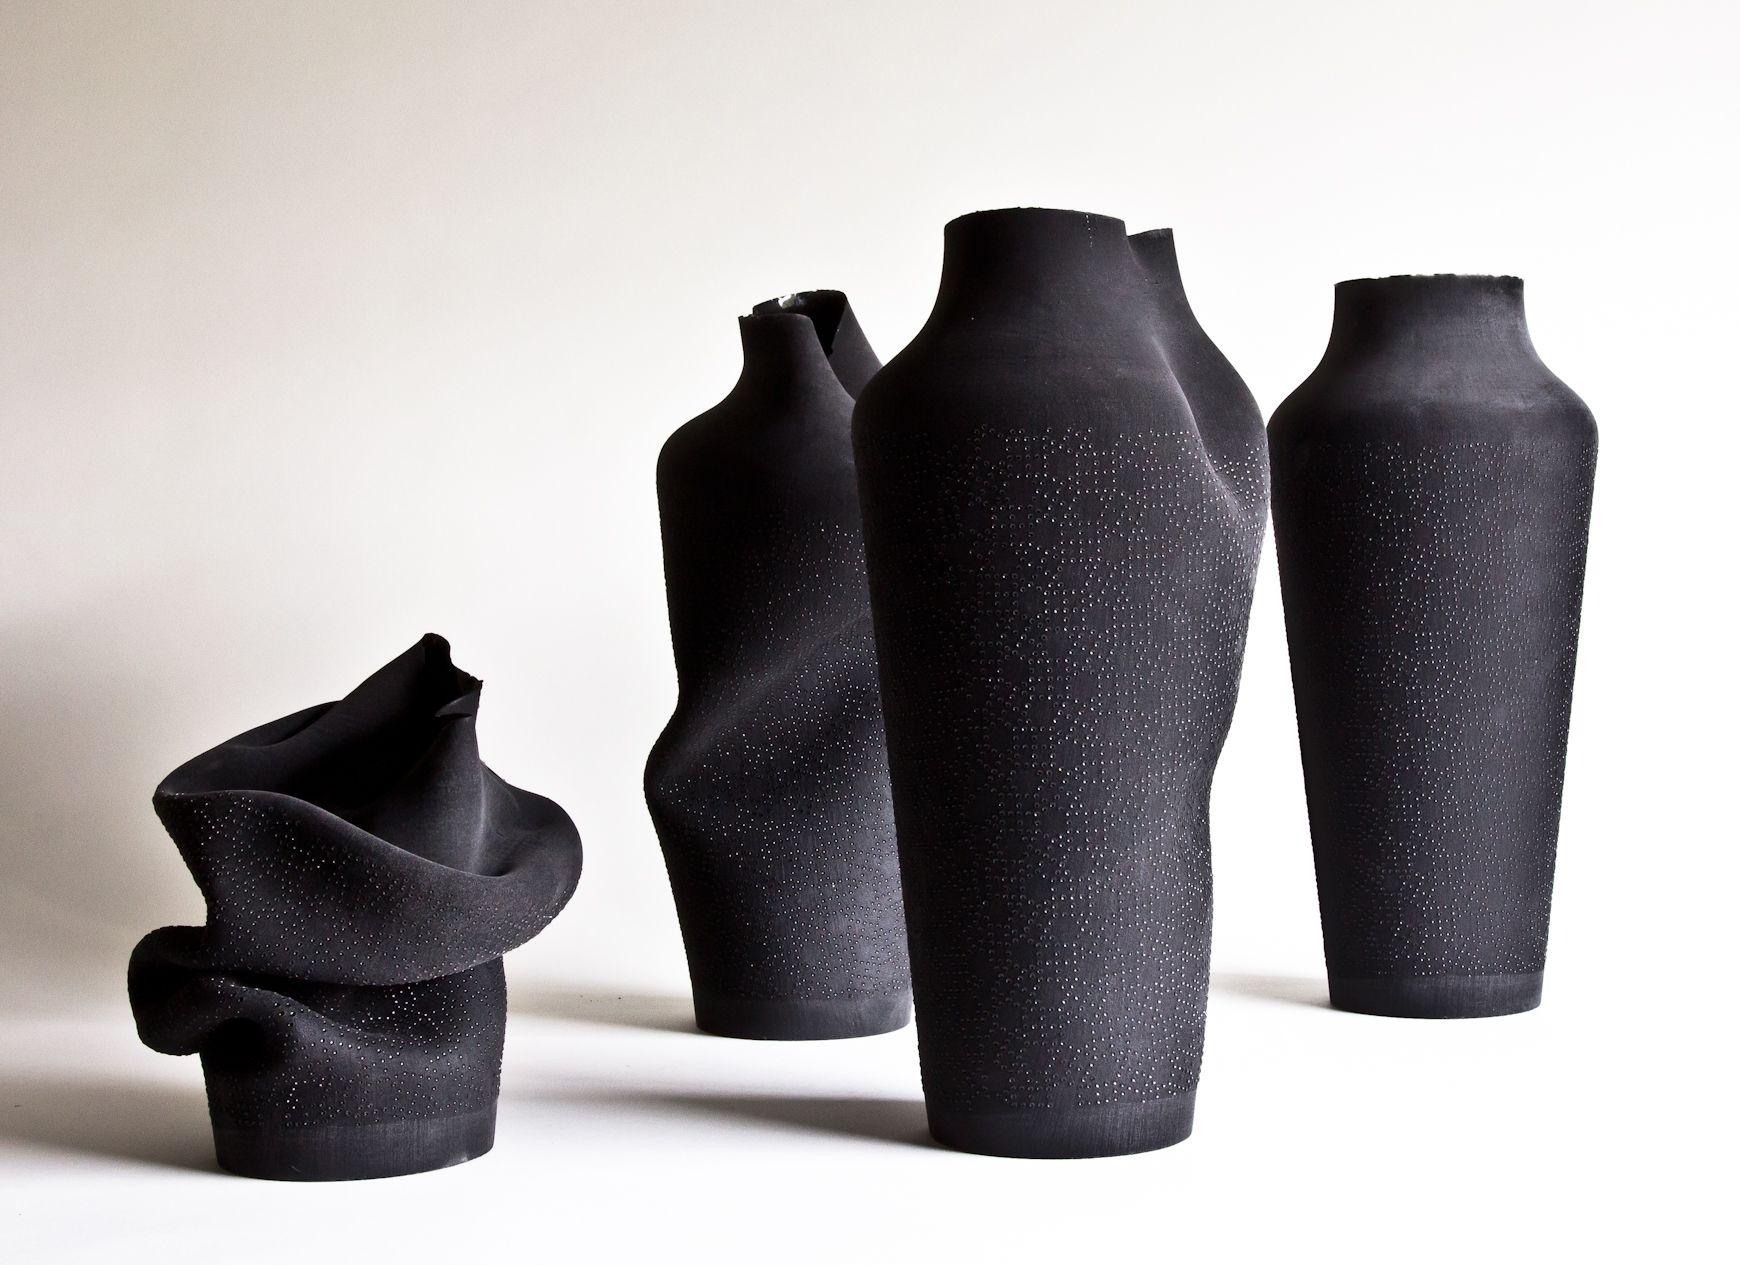 Birgit Severin, Ashes vases